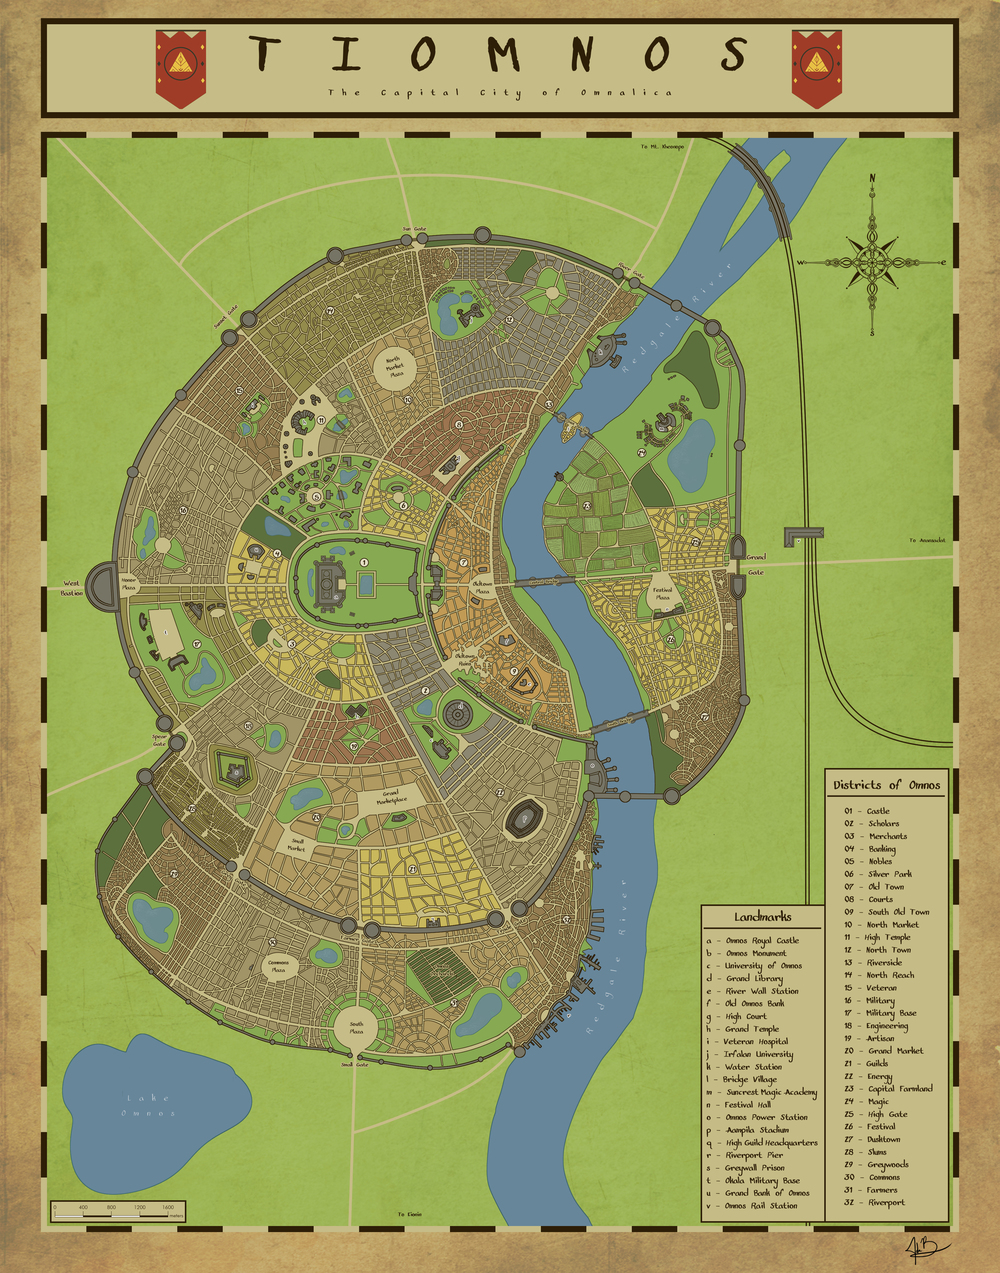 Map of Tiomnos